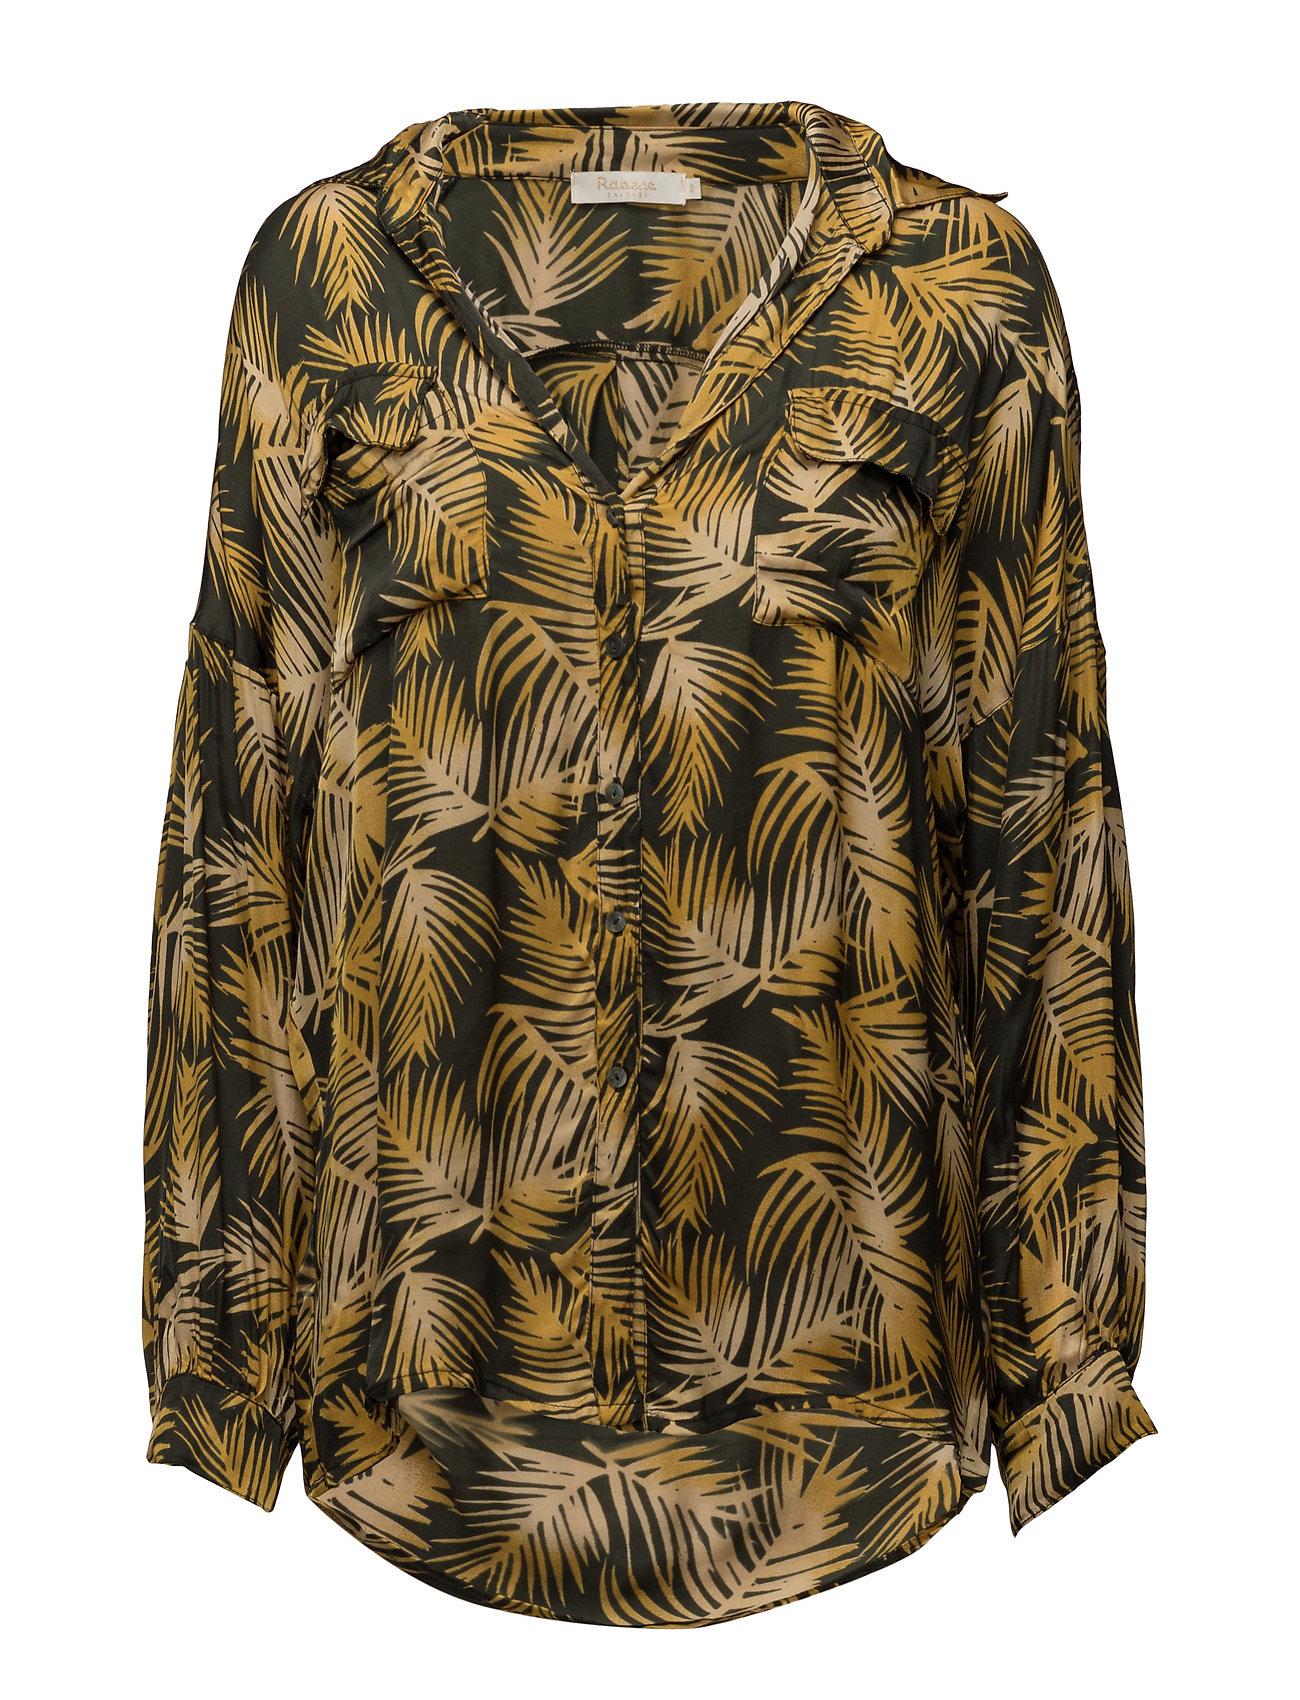 rabens saloner – Palm shirt på boozt.com dk